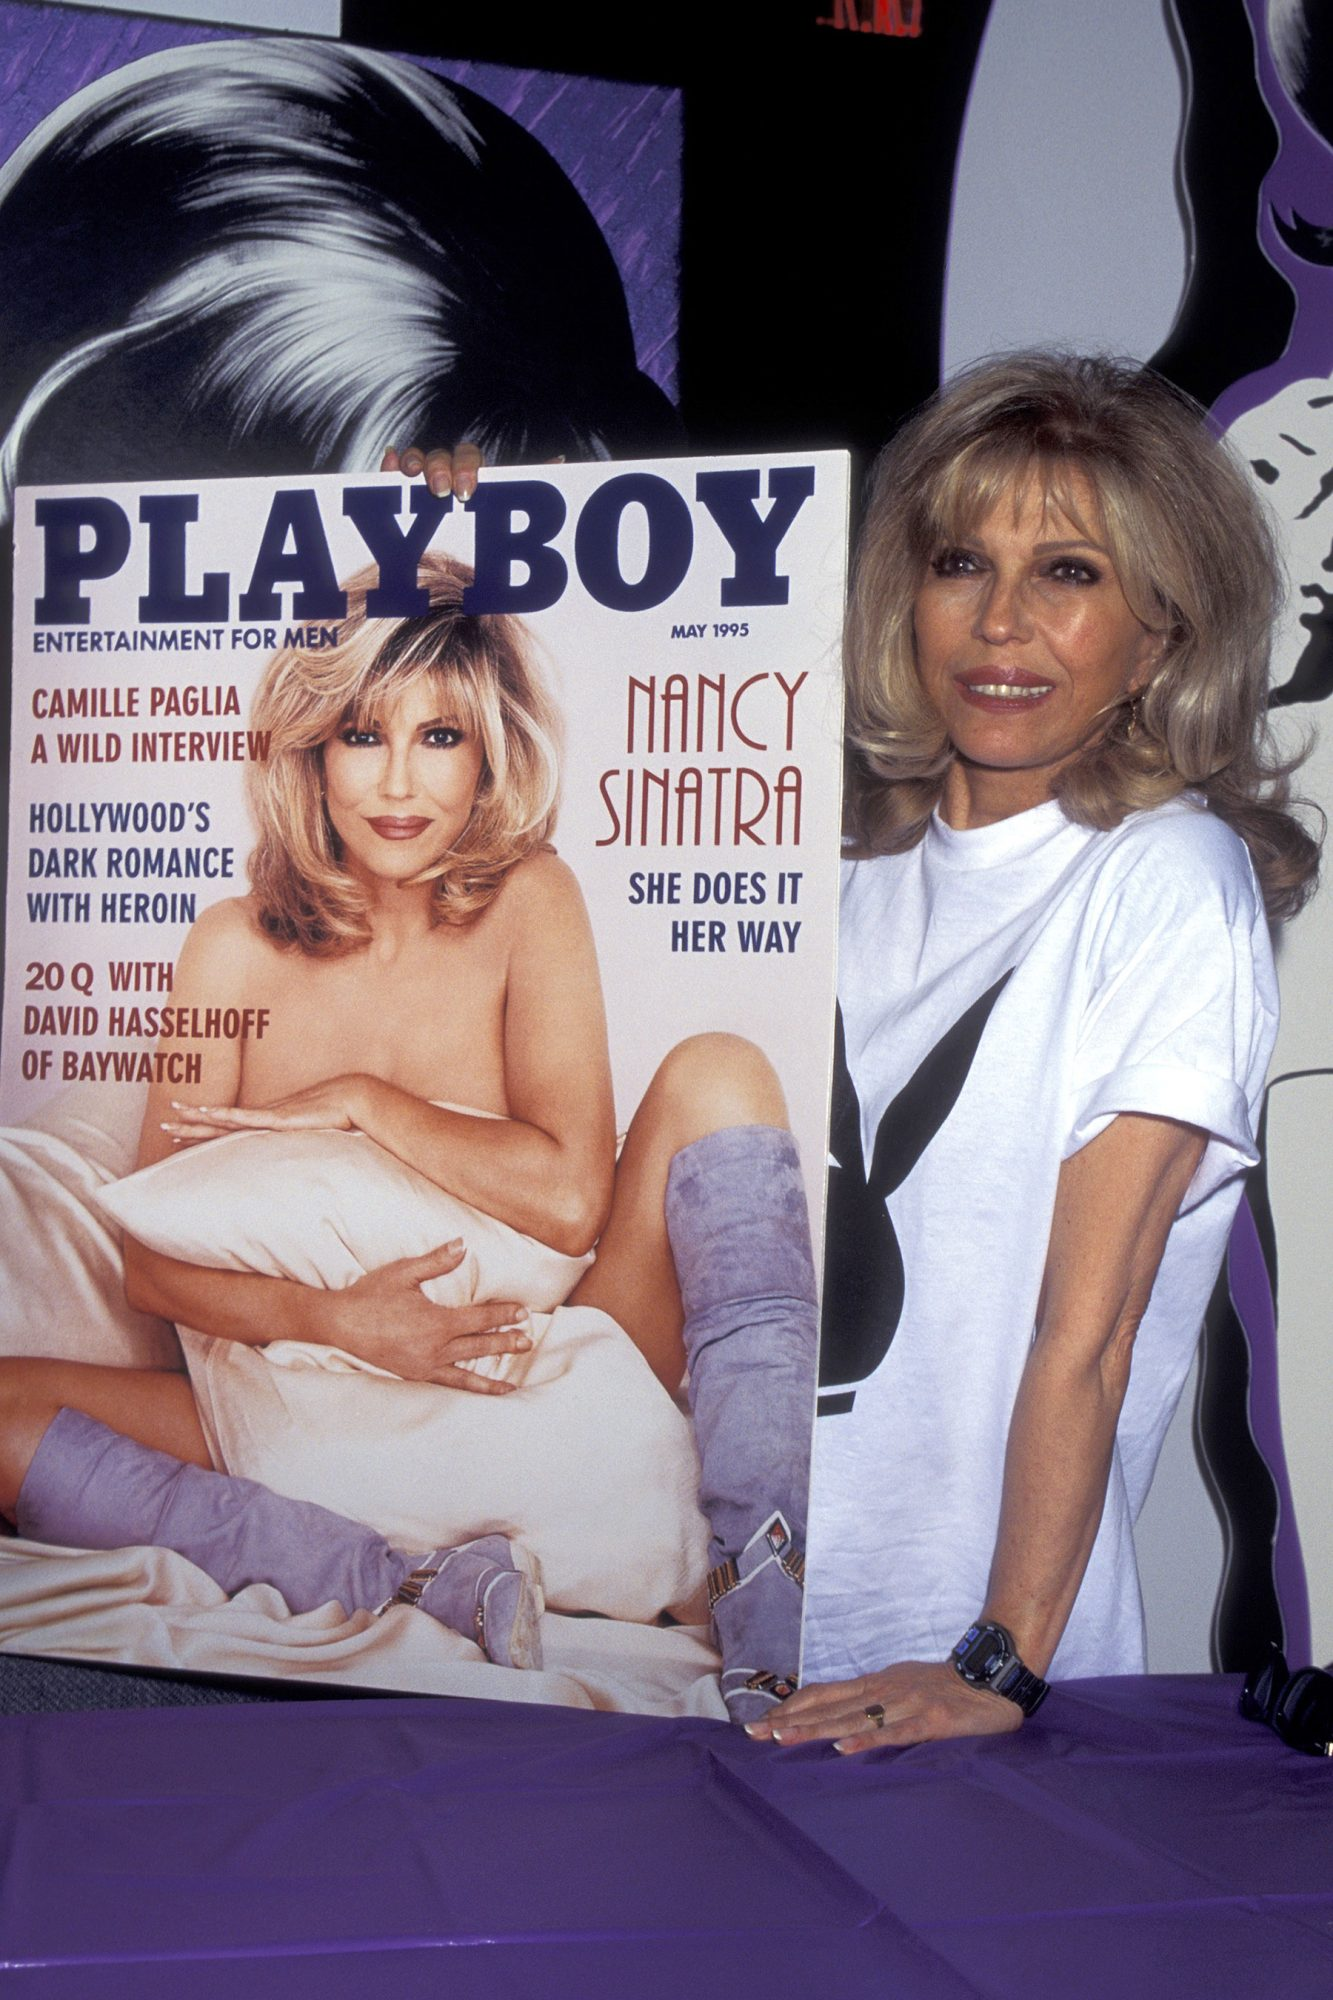 Nancy Sinatra Autographing Playboy Magazine & 1960's Album Reissue - April 14, 1995